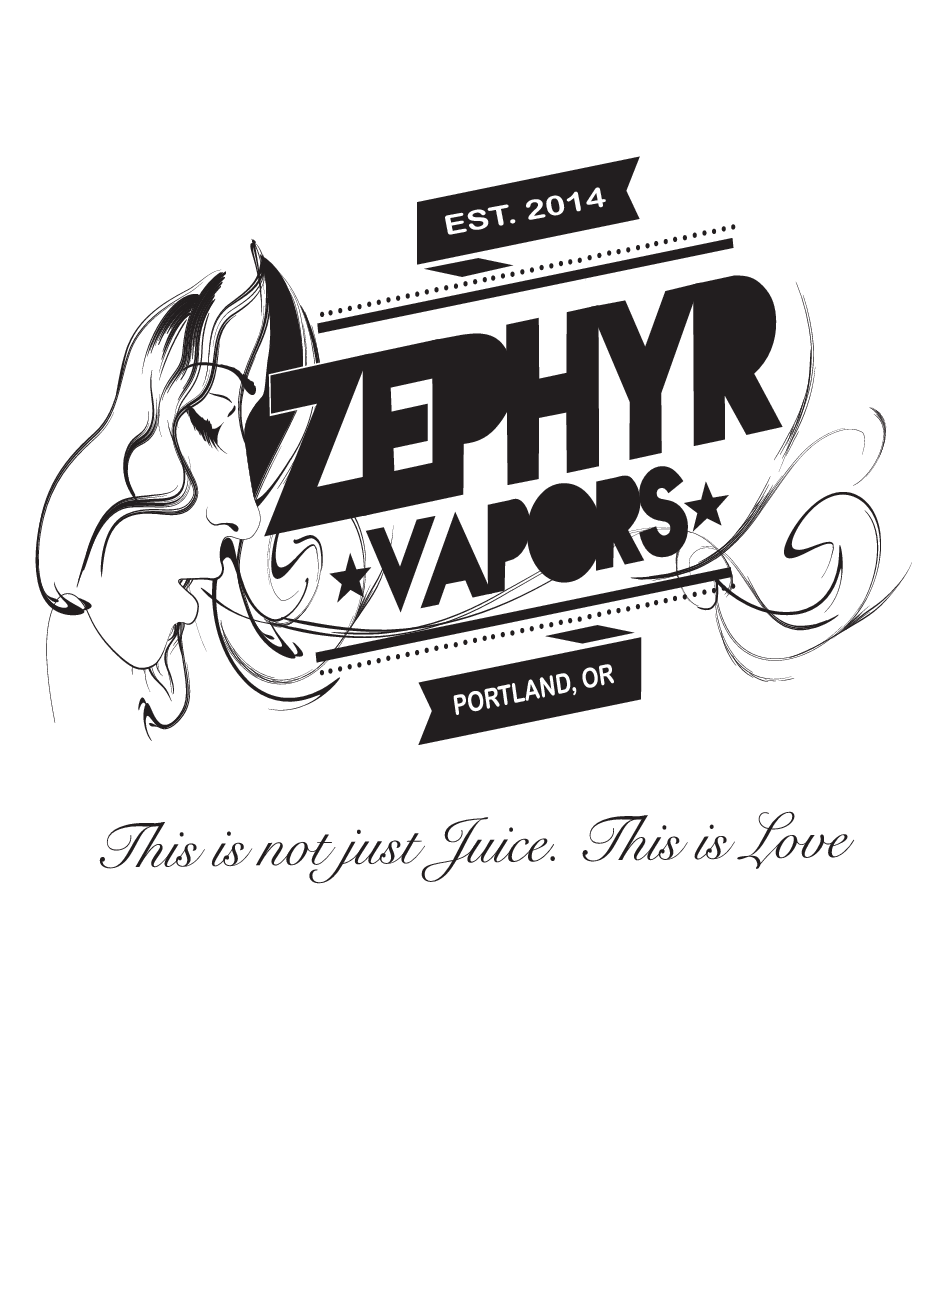 Zephyr Vapors